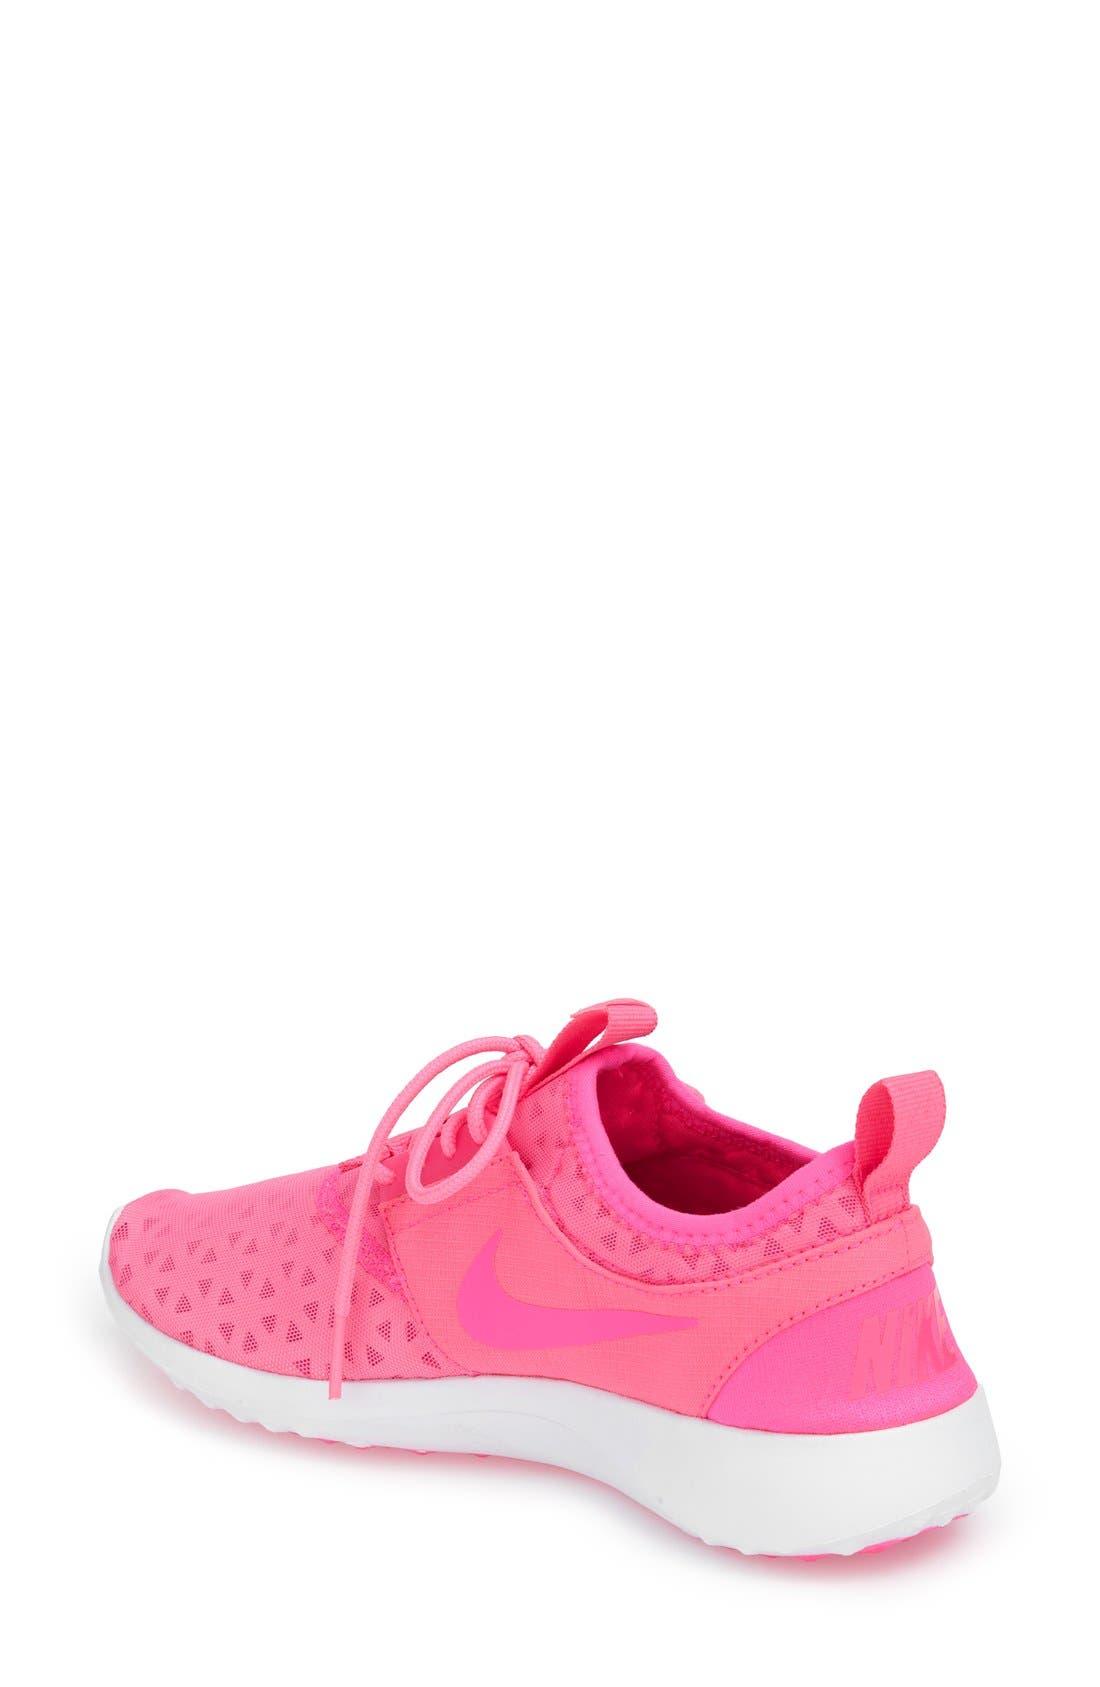 Juvenate Sneaker,                             Alternate thumbnail 116, color,